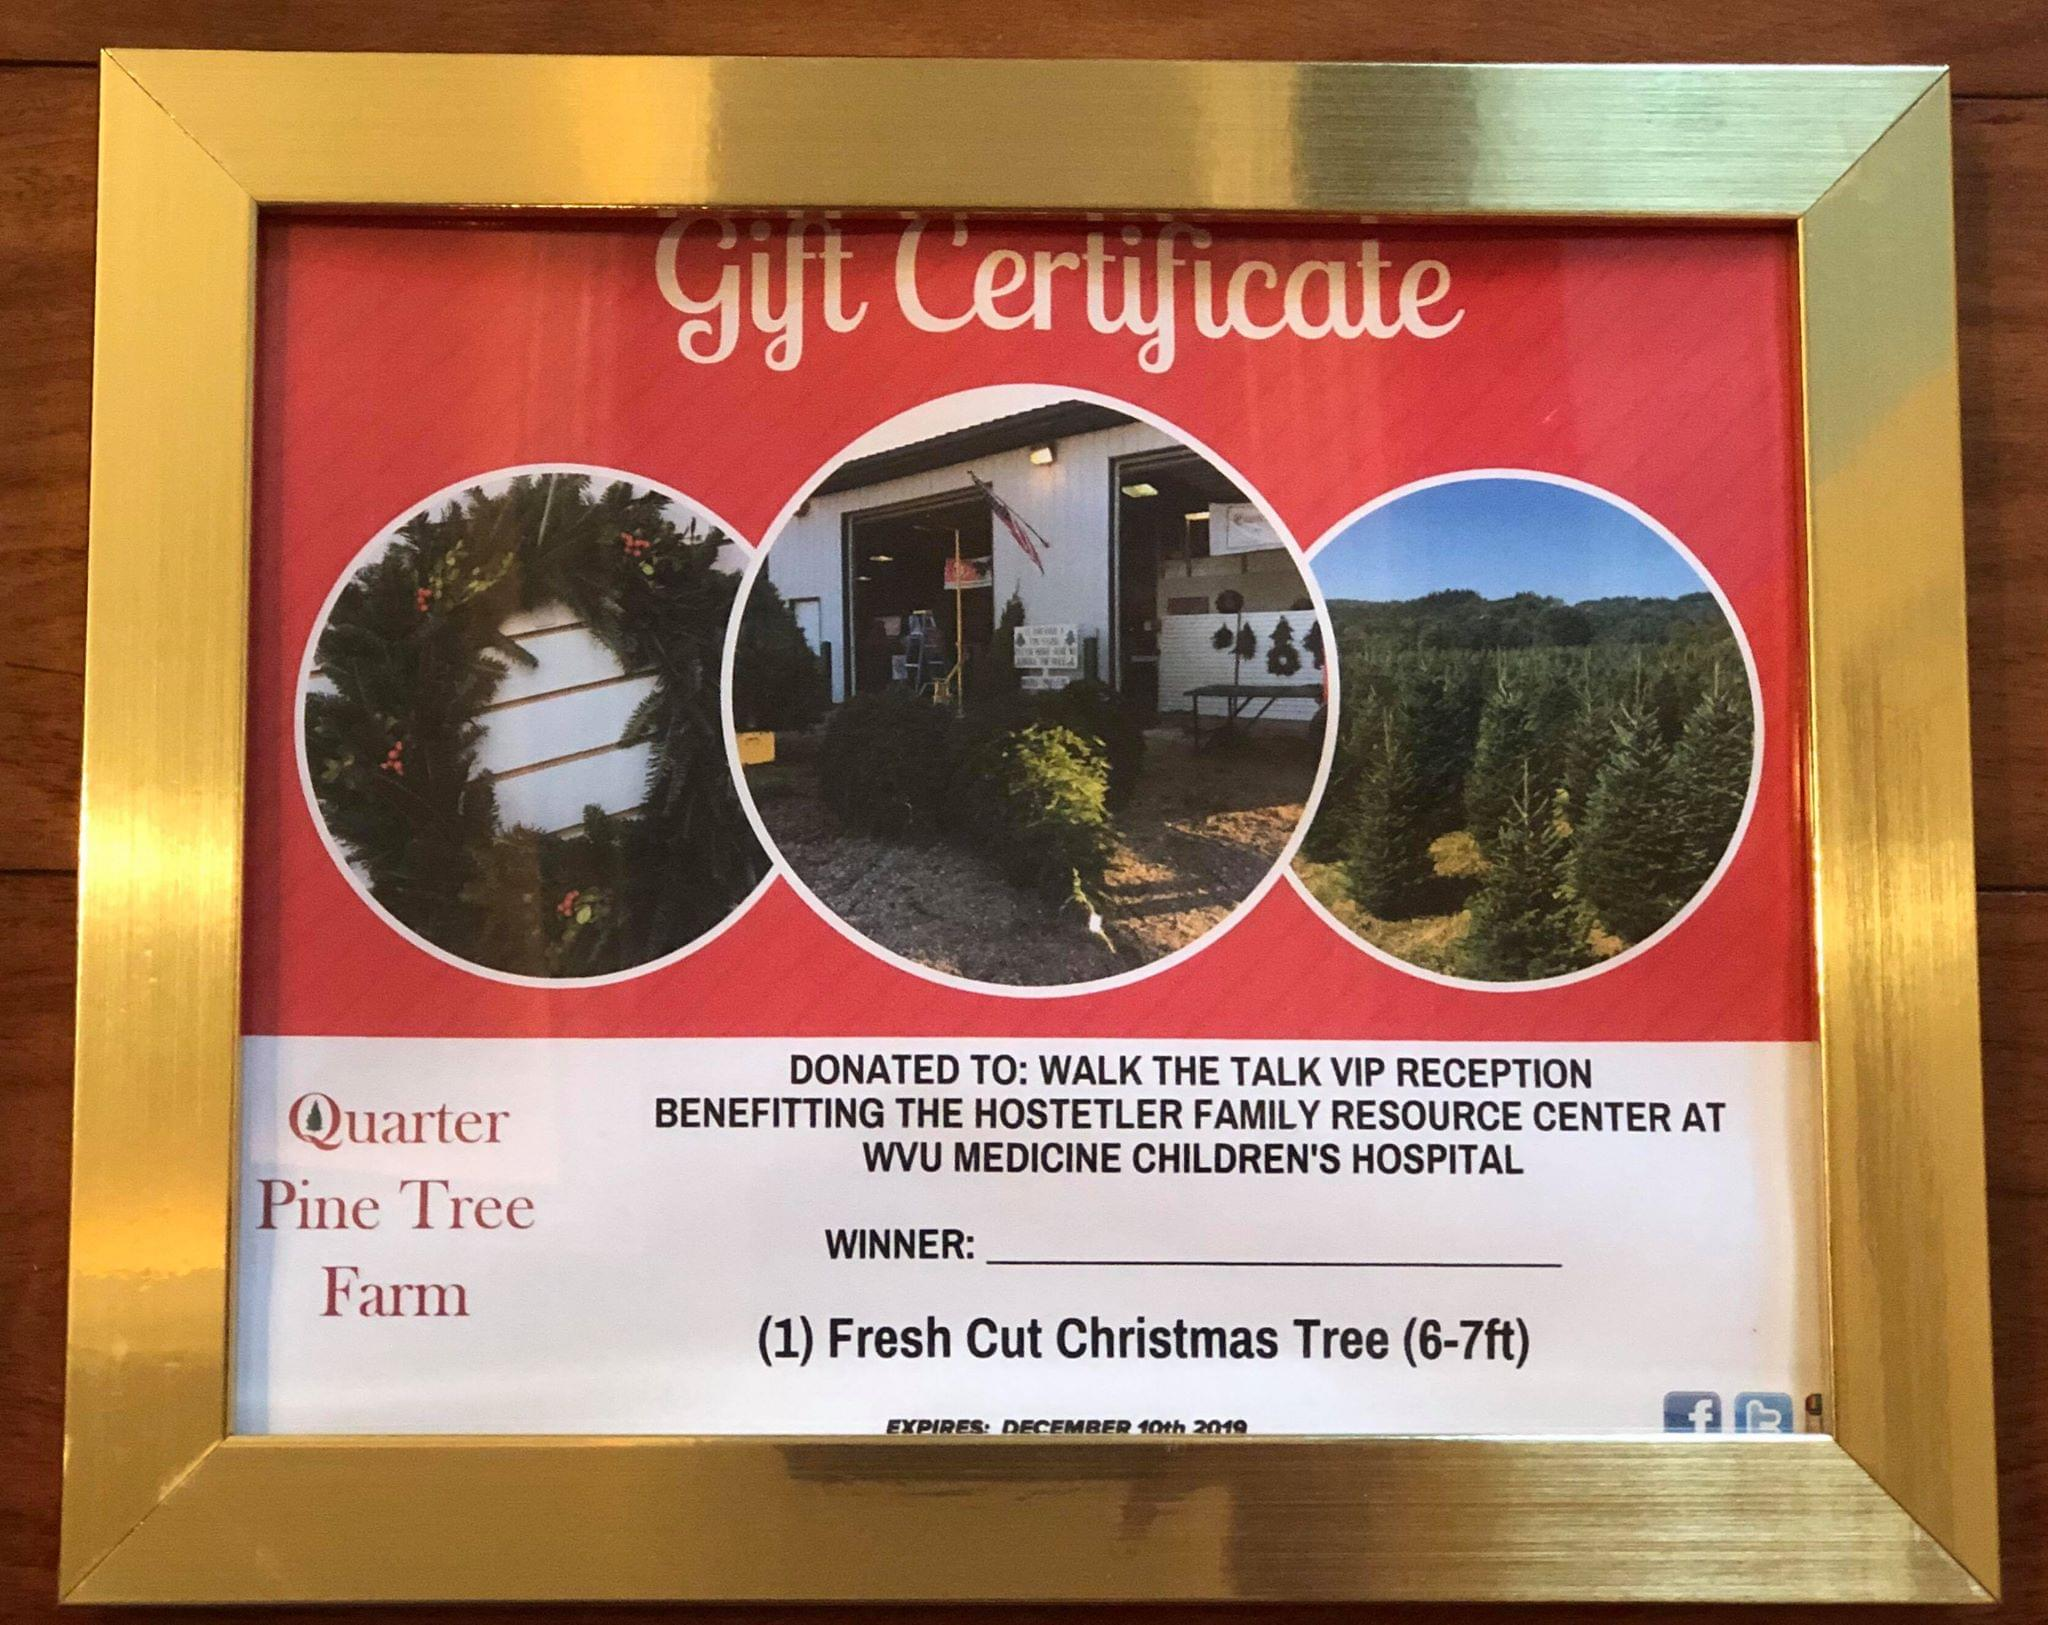 Quarter-Pine-Tree1